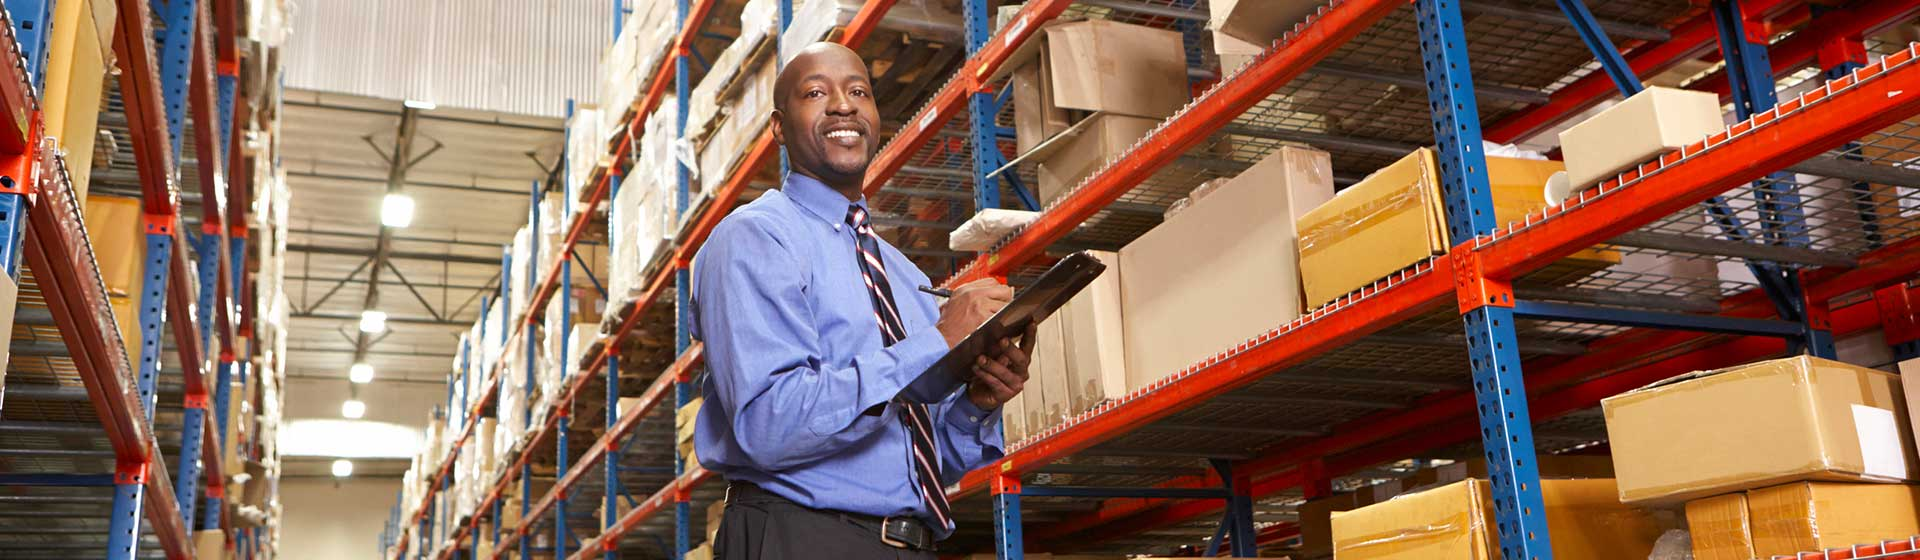 businessman warehouse - Business Banking